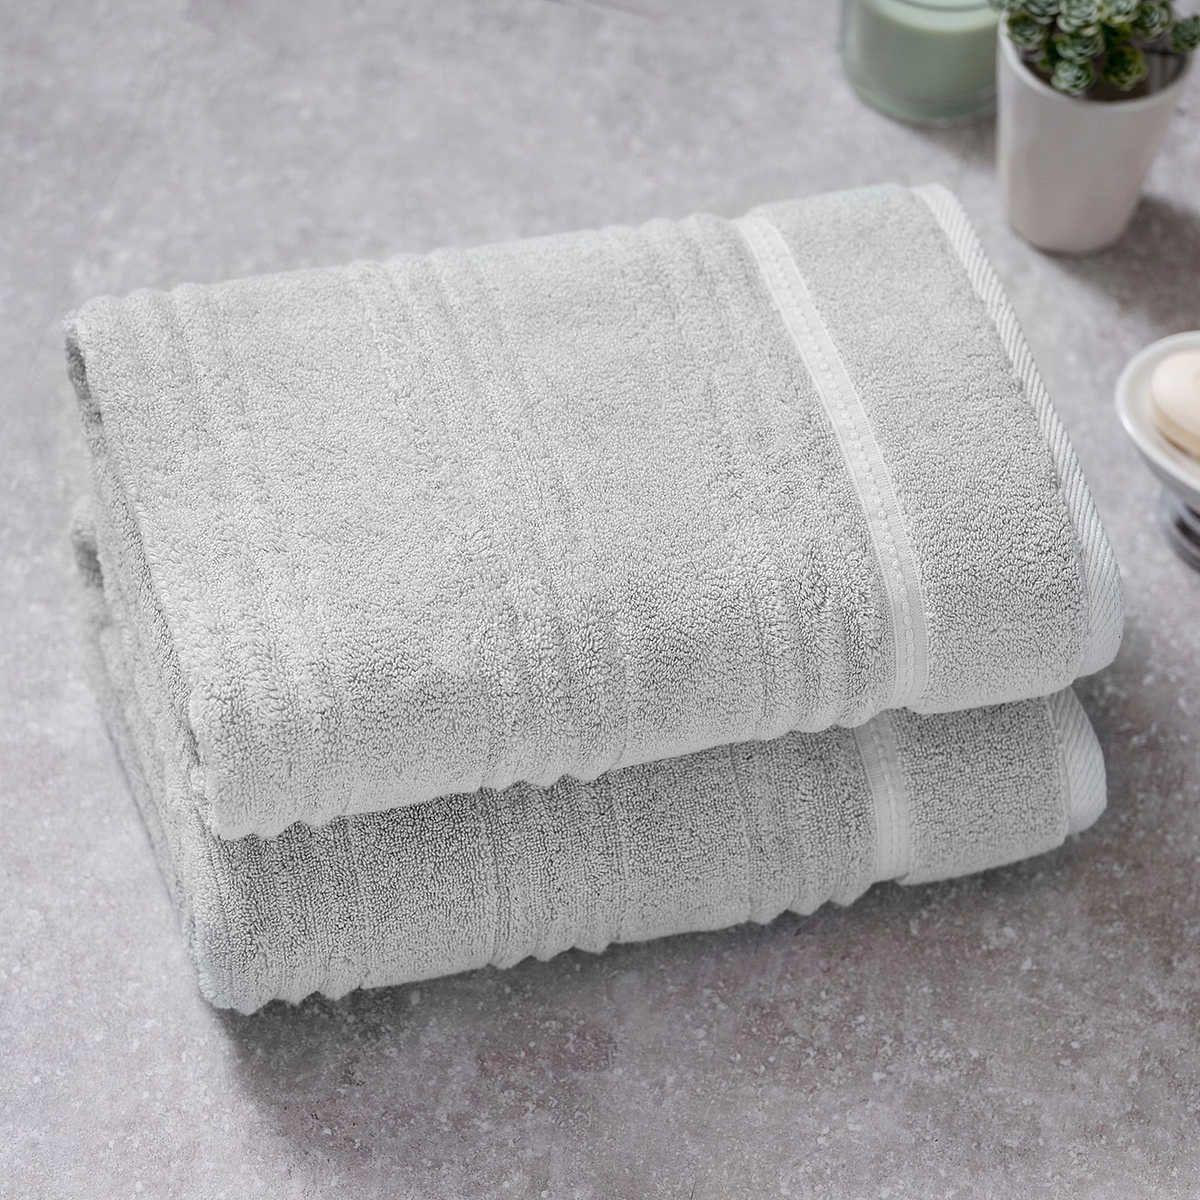 Charisma Bumpy Rib 2 Piece Bath Towel Set With Images Towel